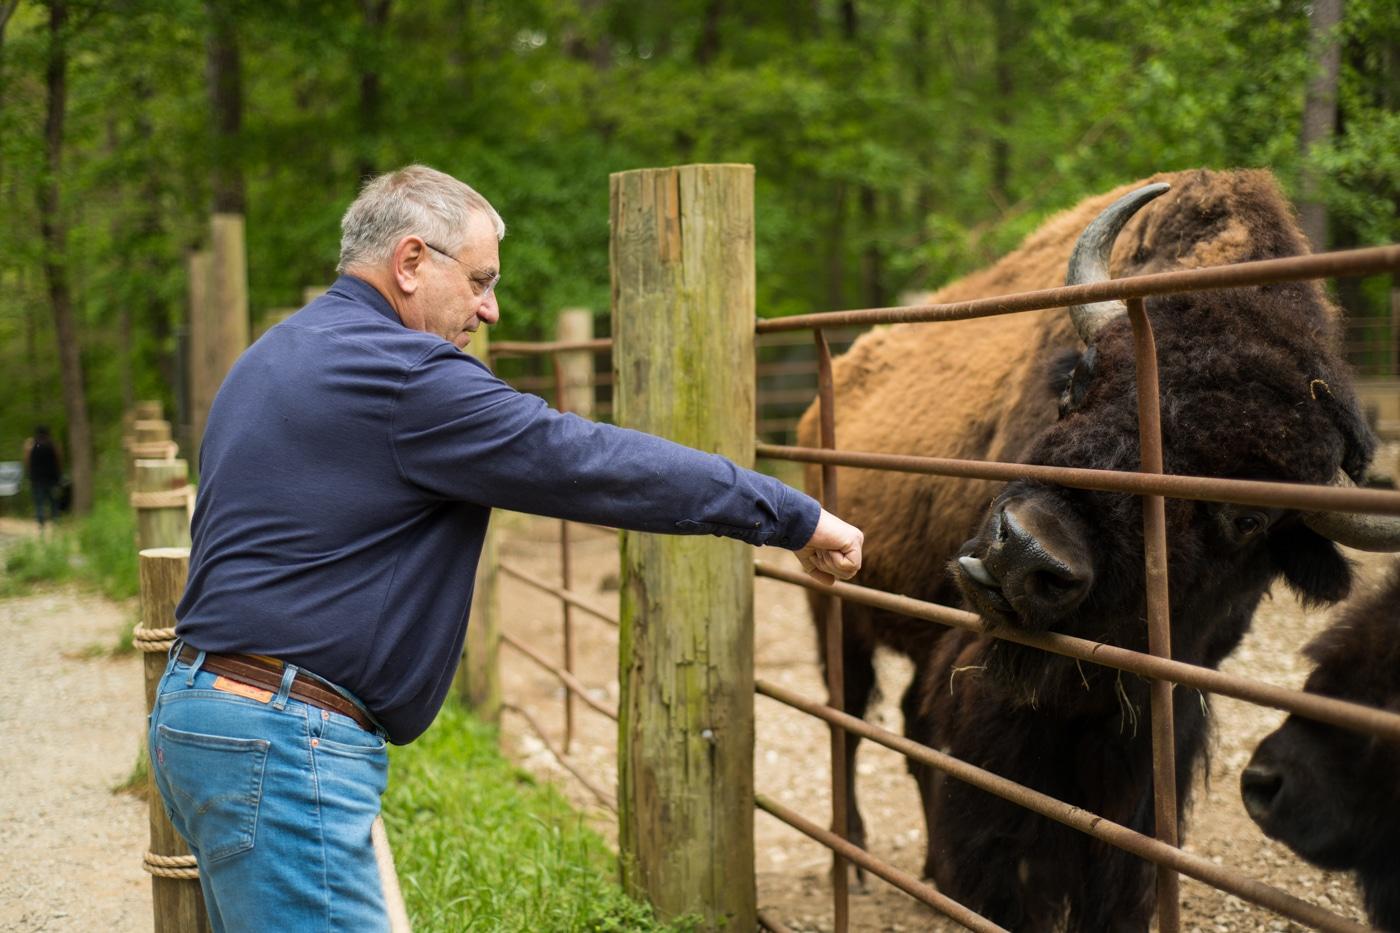 granddad feeds bison during family photos in Atlanta